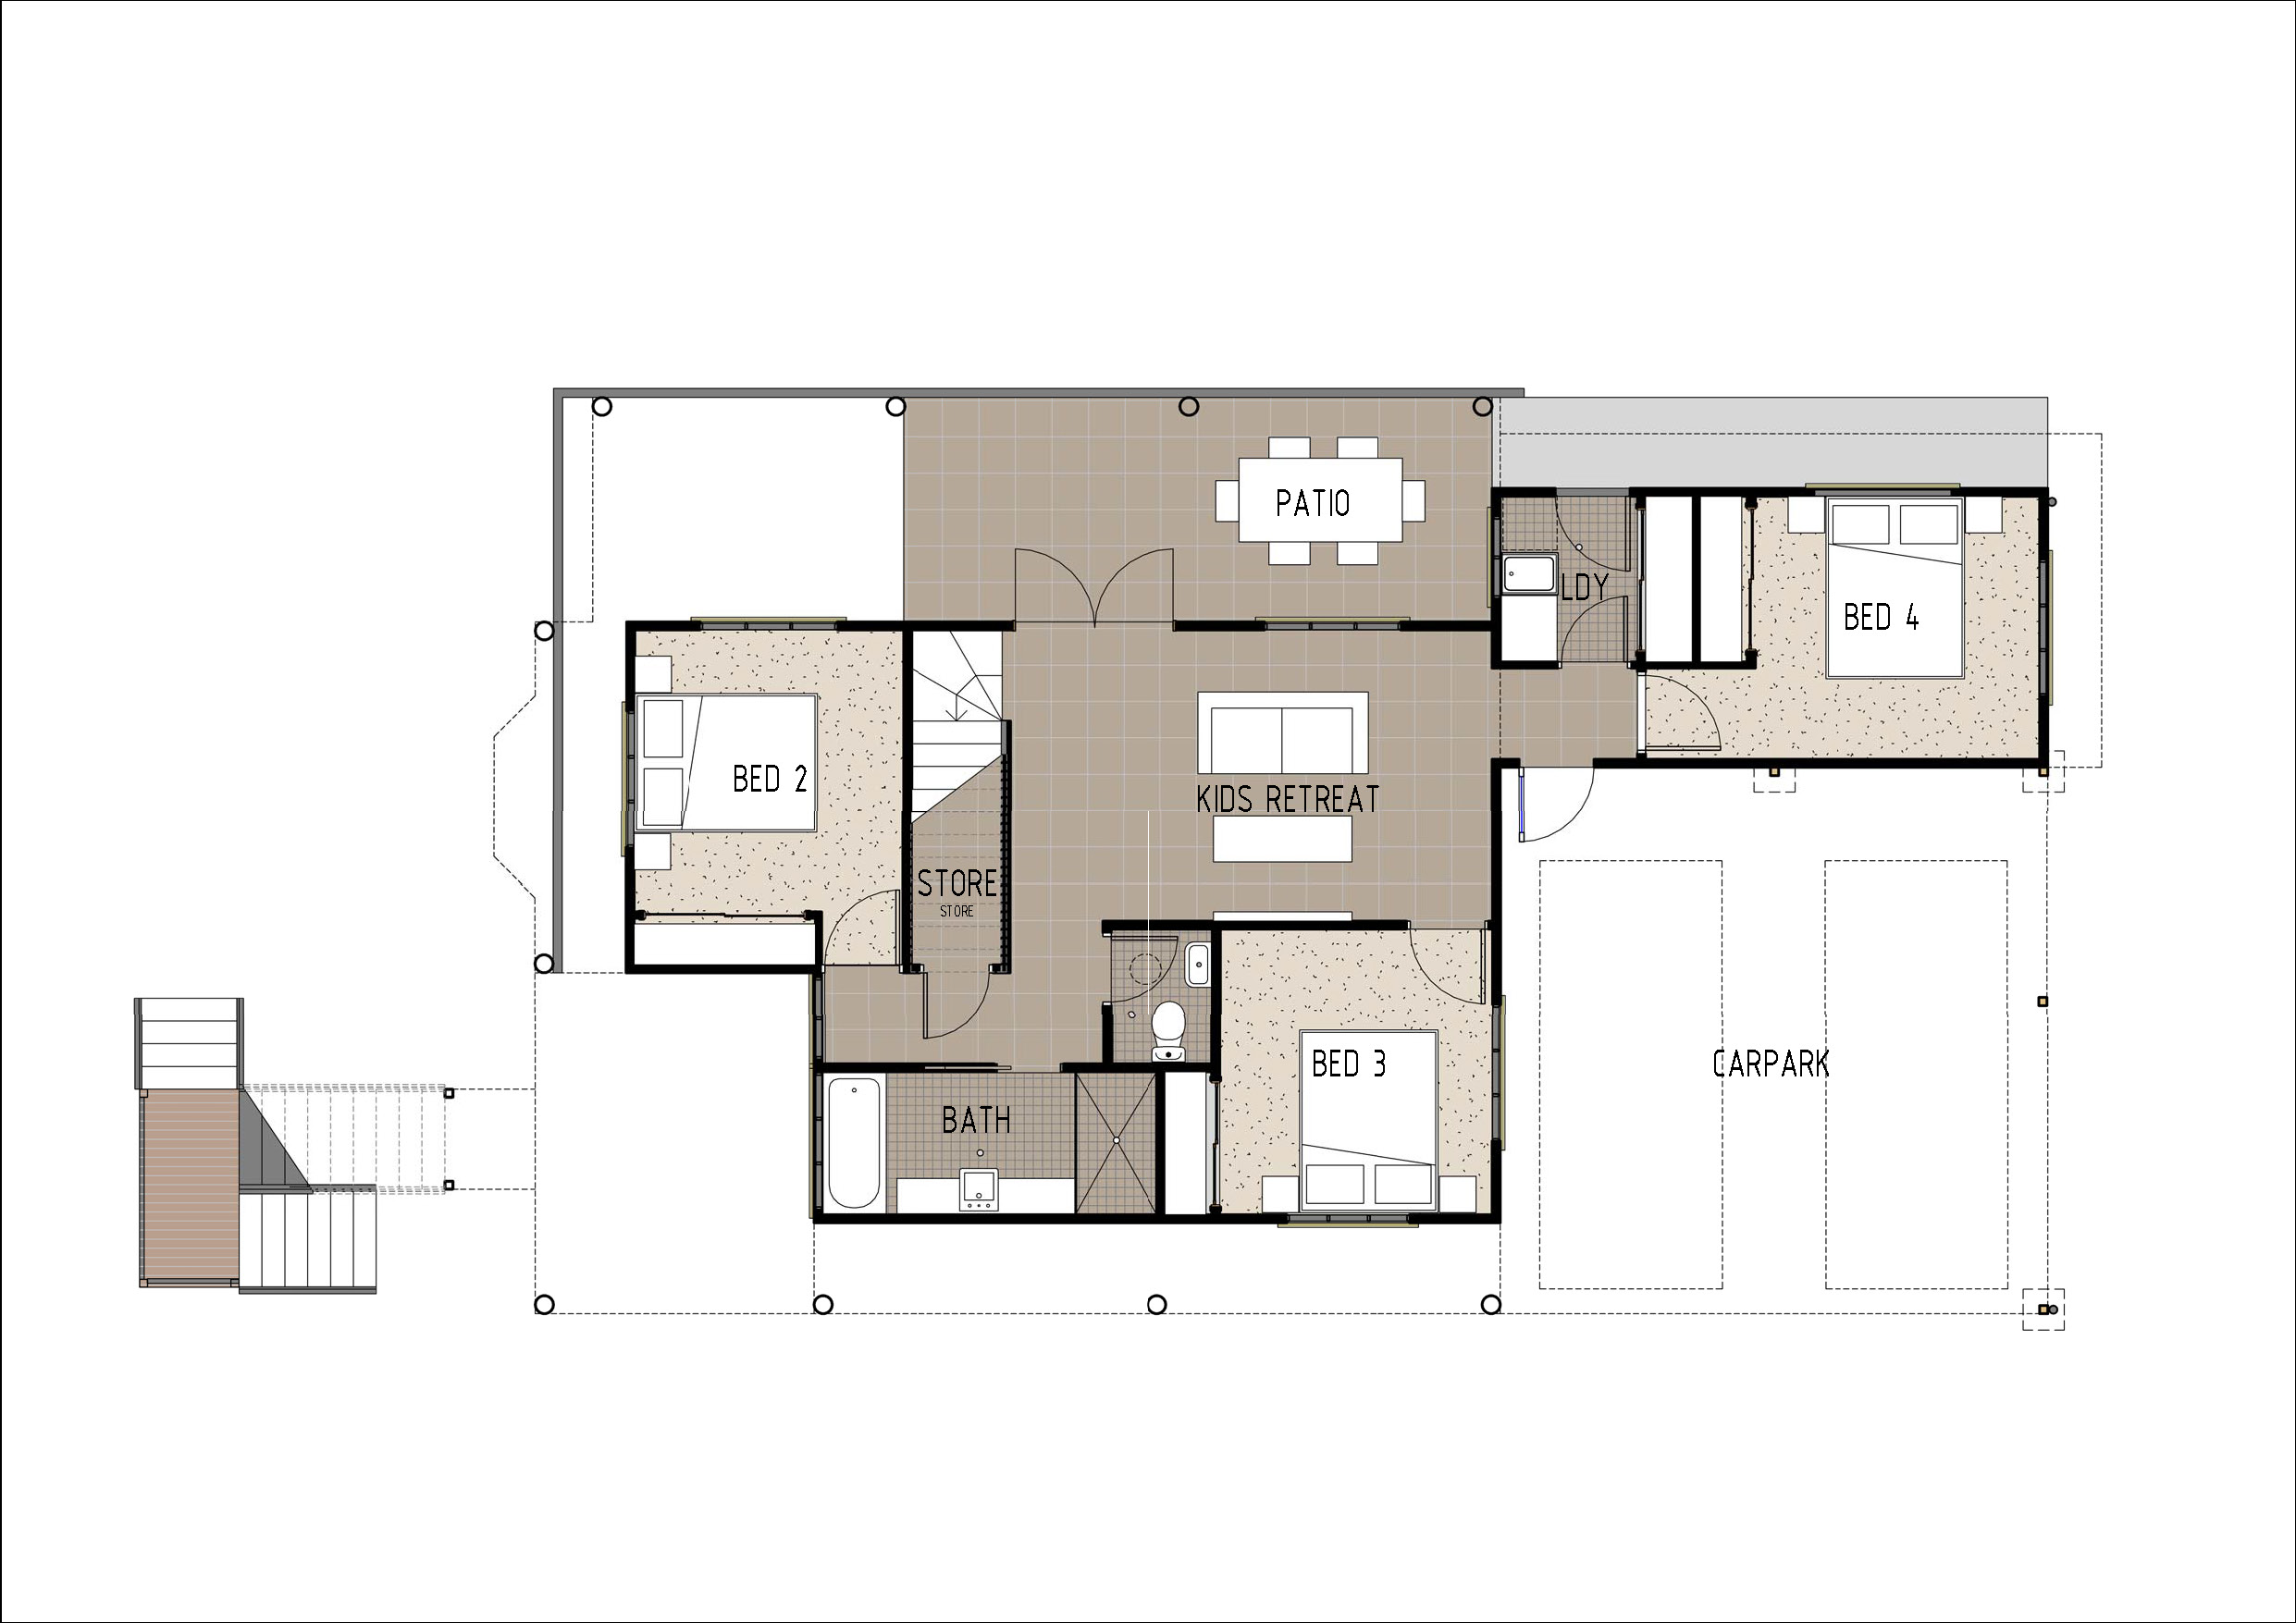 T4018 - Sheet - A802 - ground floor plan - colour.jpg